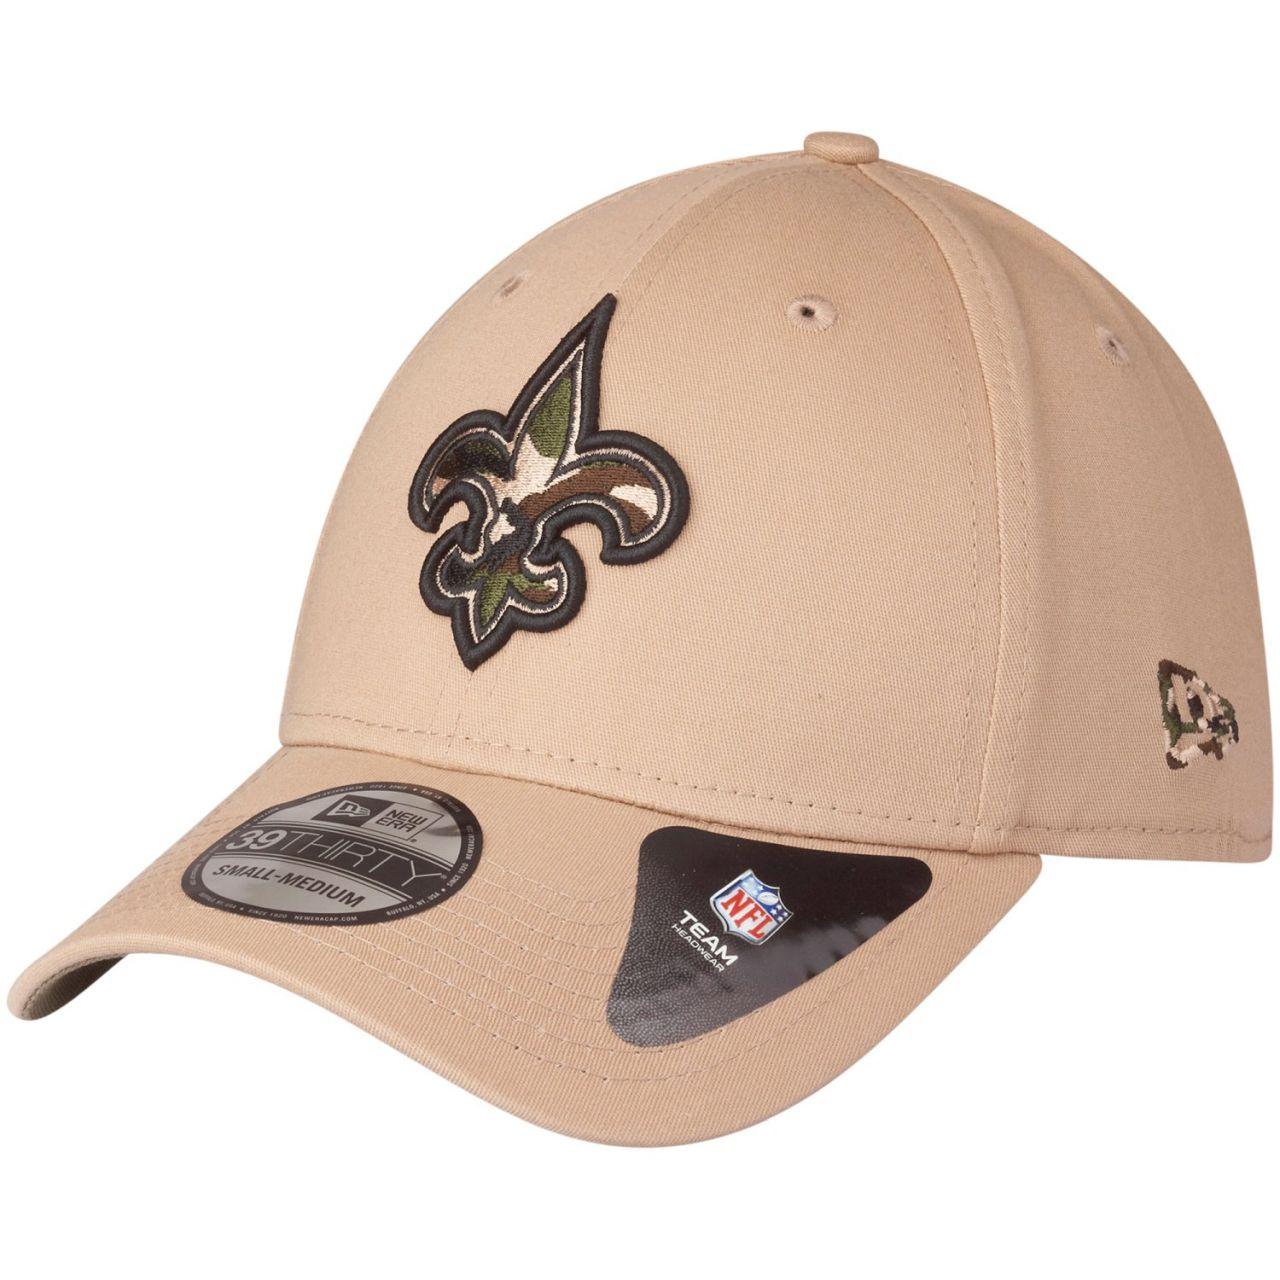 amfoo - New Era 39Thirty Stretch Cap - CAMO New Orleans Saints